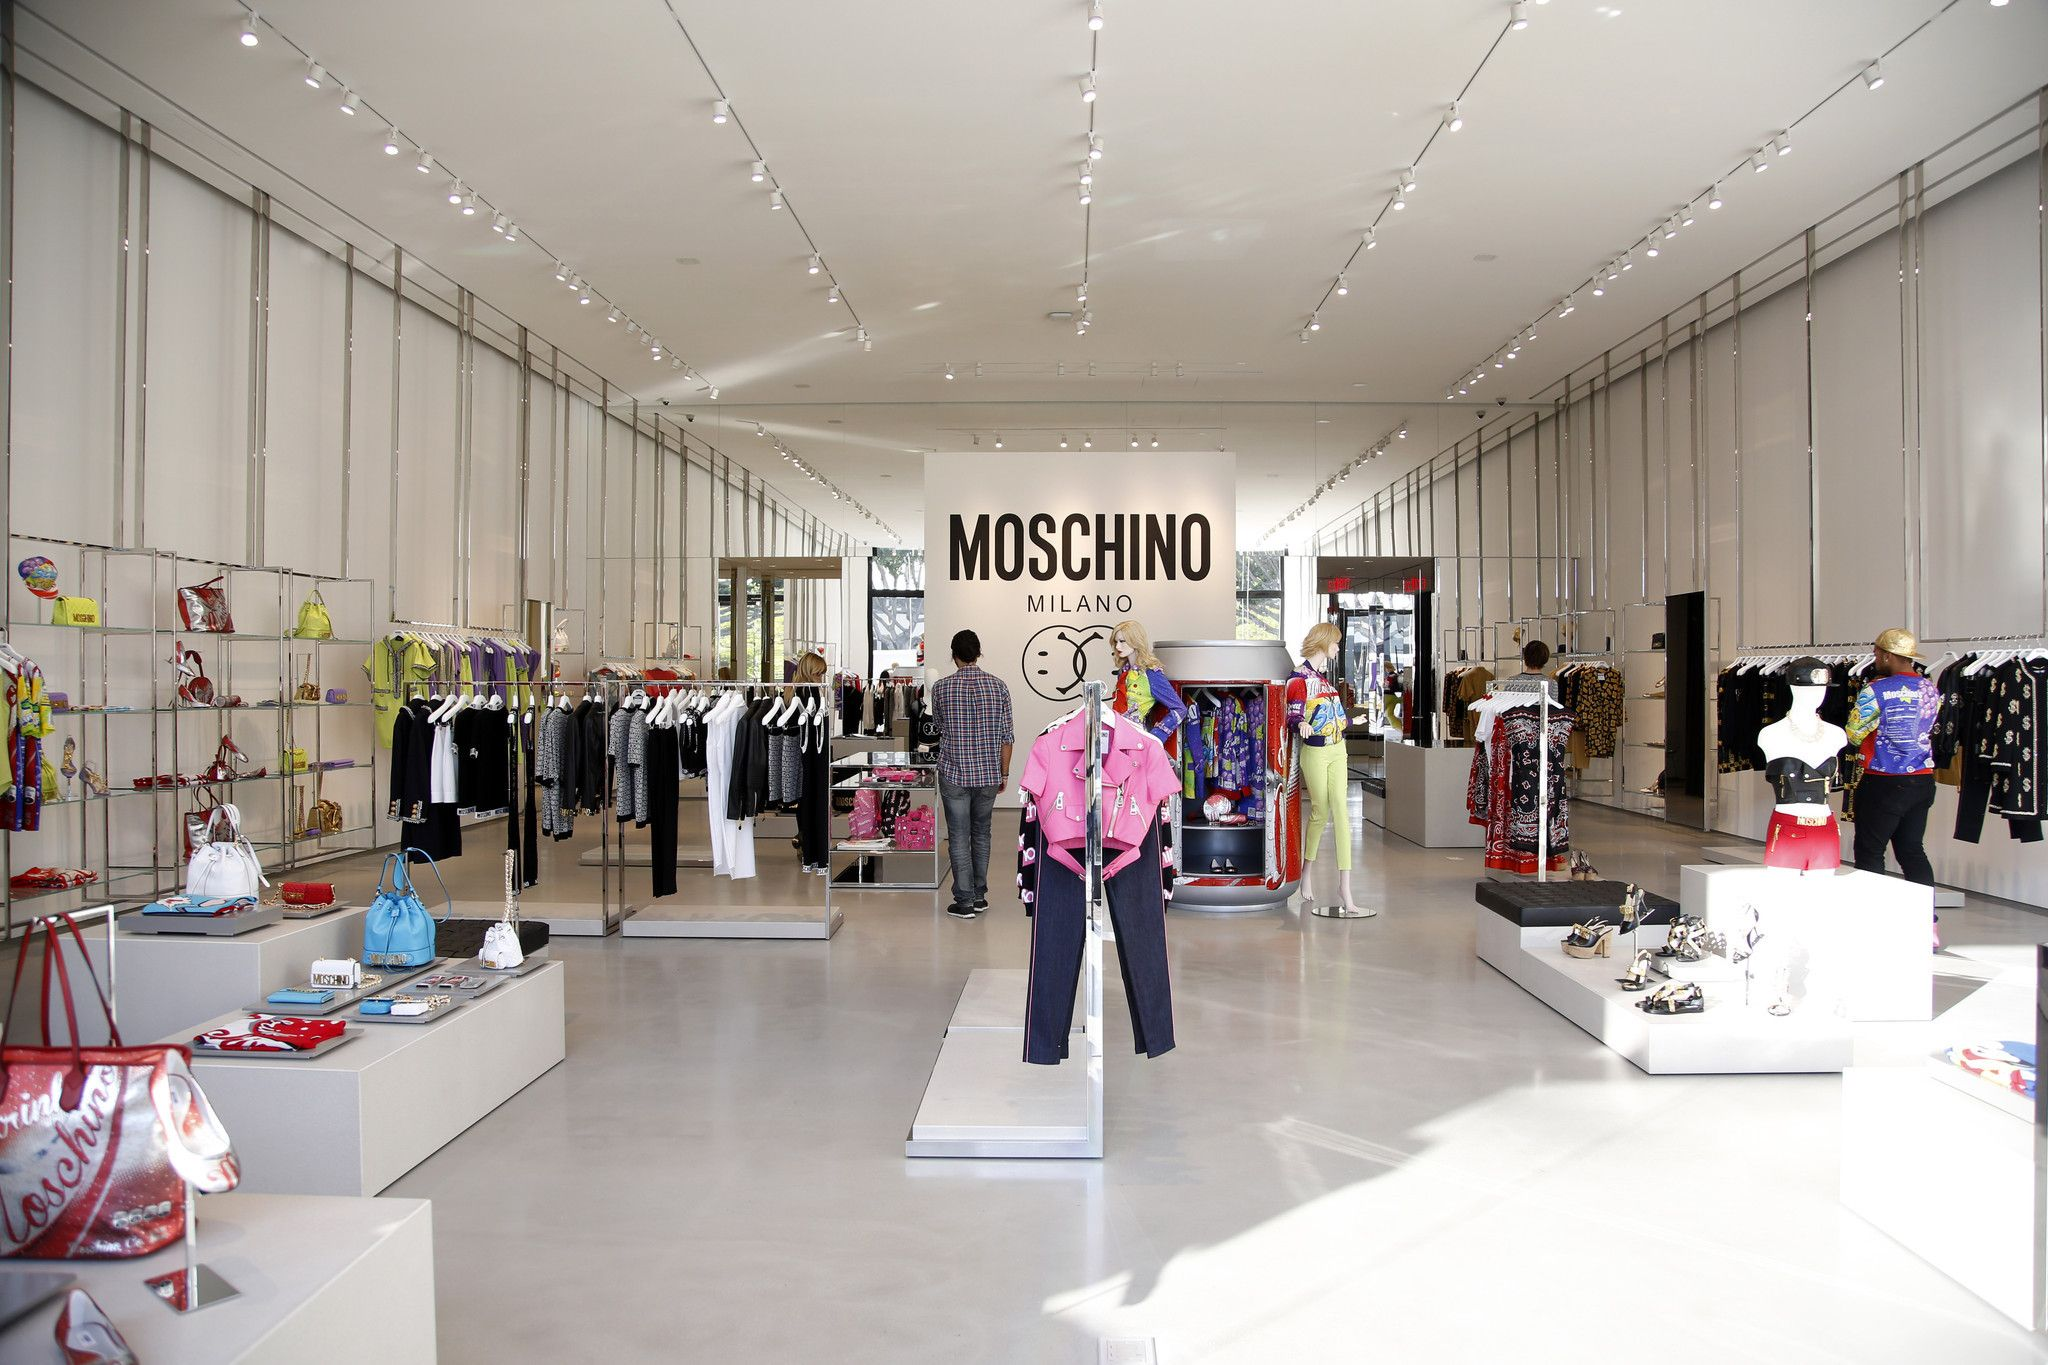 la-ar-jeremy-scott-opens-first-moschino-store-in-la-20150121 (2048×1365)